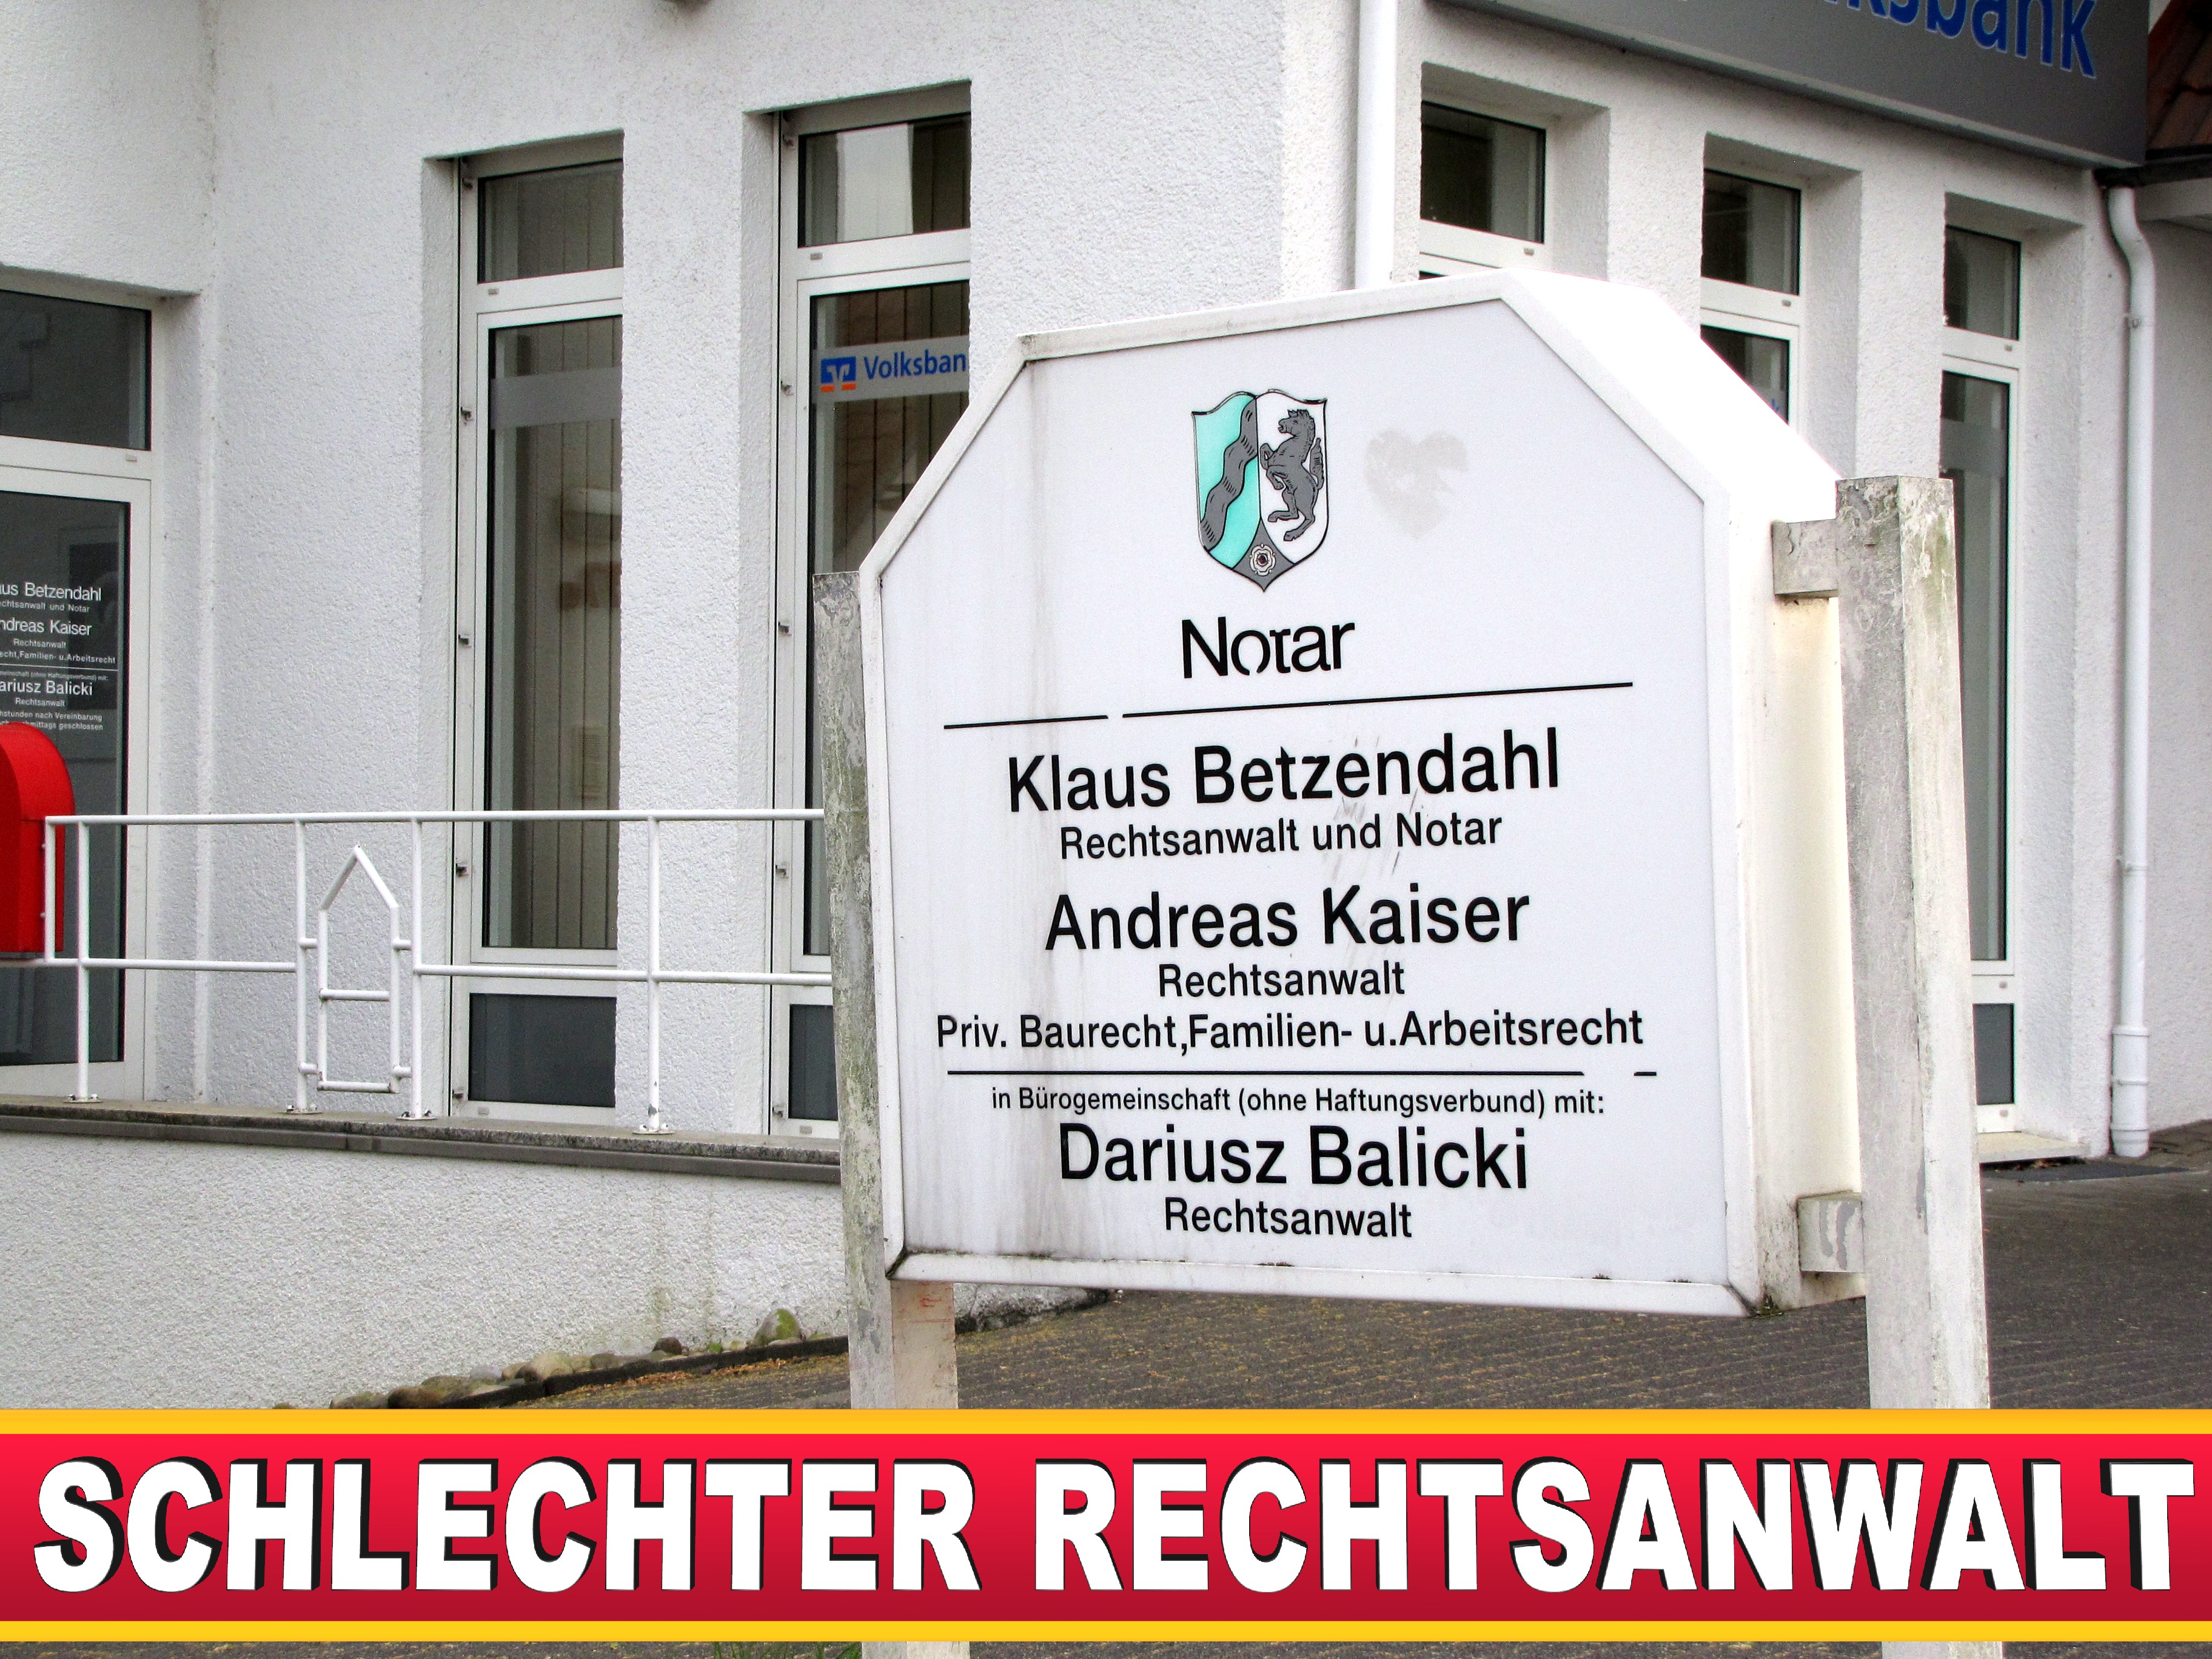 RECHTSANWALT ANDREAS KAISER Carl Severing Straße Bielefeld (9)